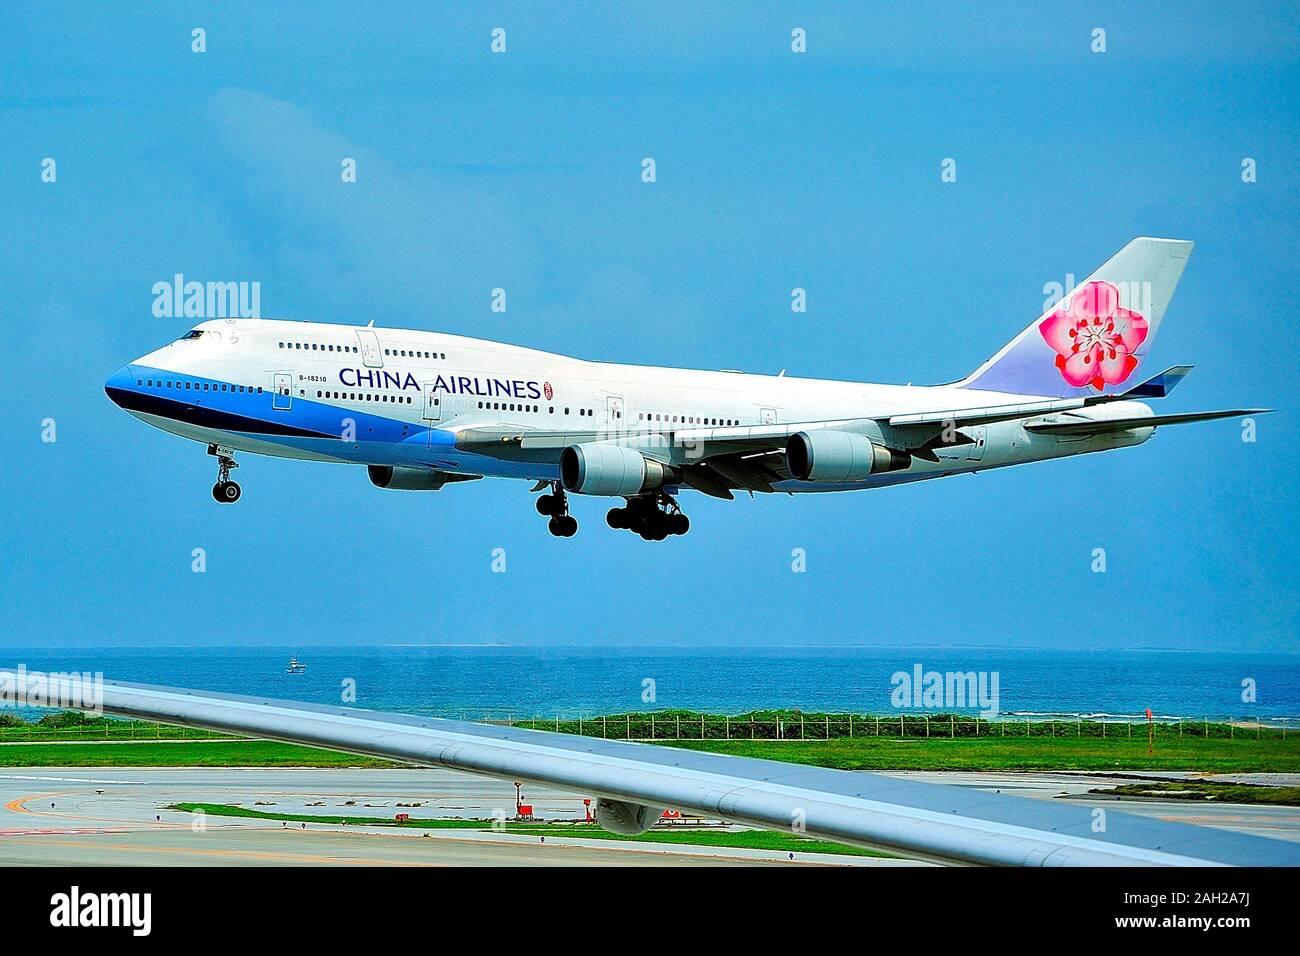 China Airlines Boeing B -747-400, B -18210, Landung am Flughafen Naha, Okinawa, Japan Stockfoto